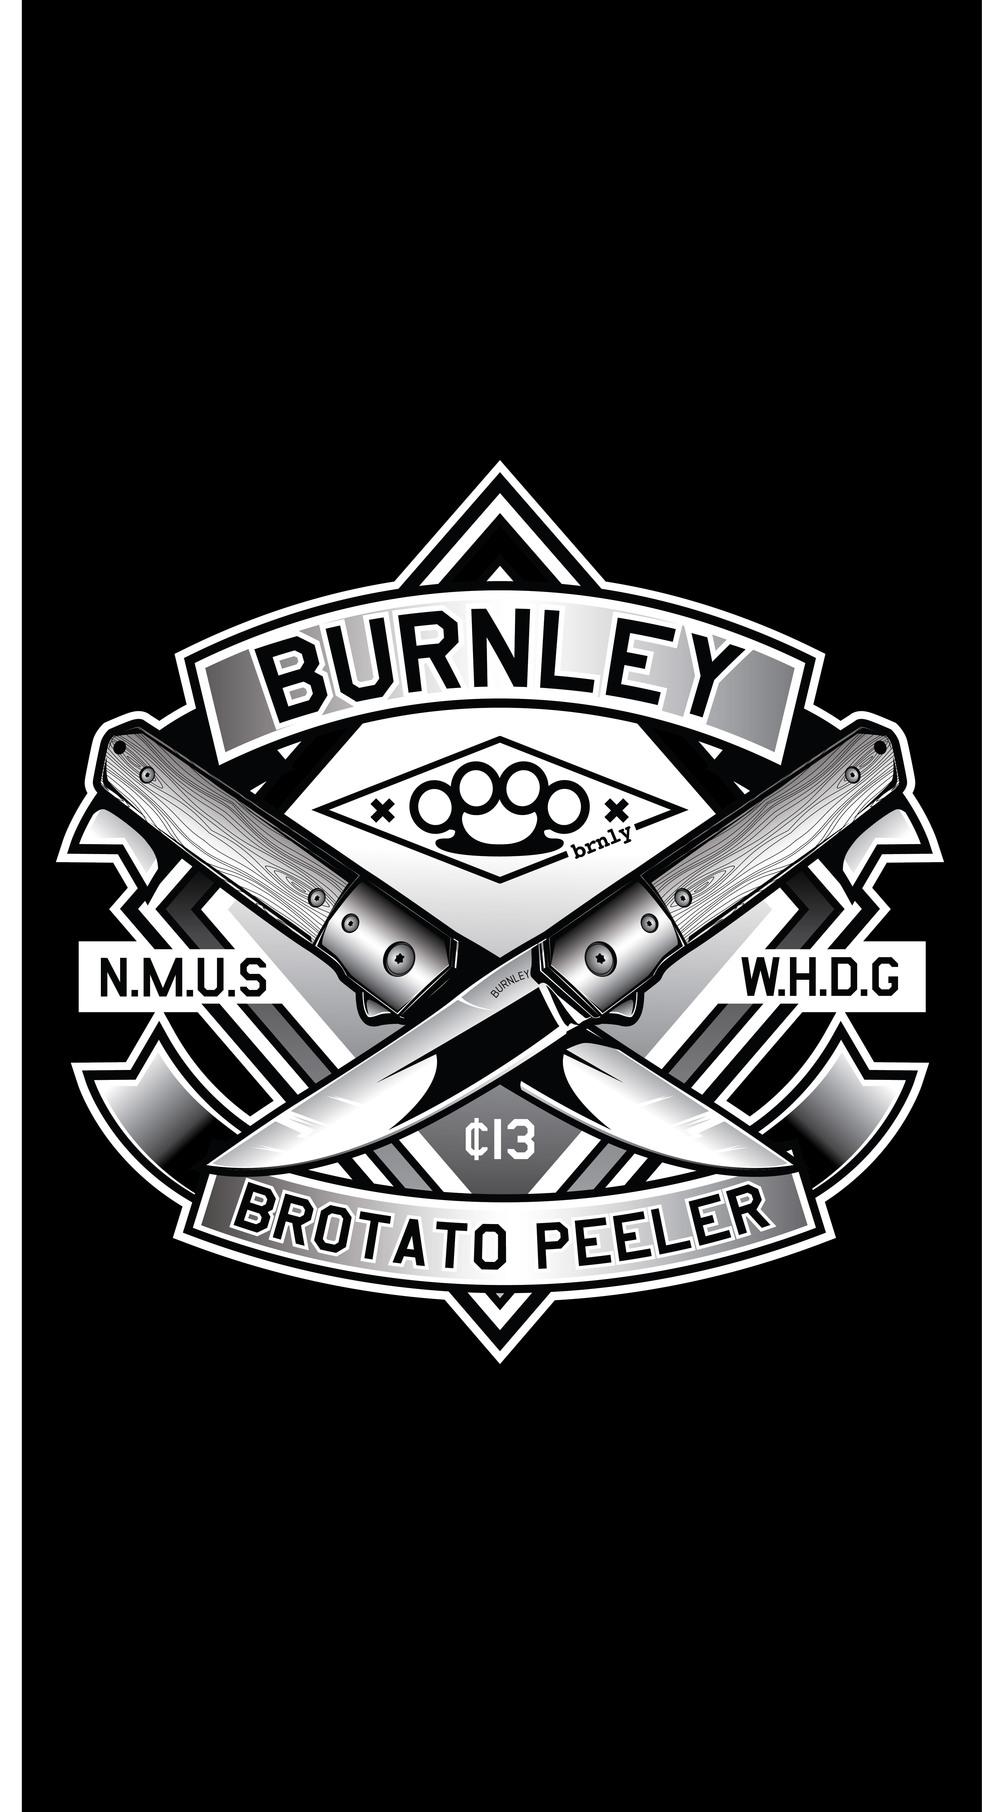 BURNLEY BROTATO PEELER BLACK.jpg